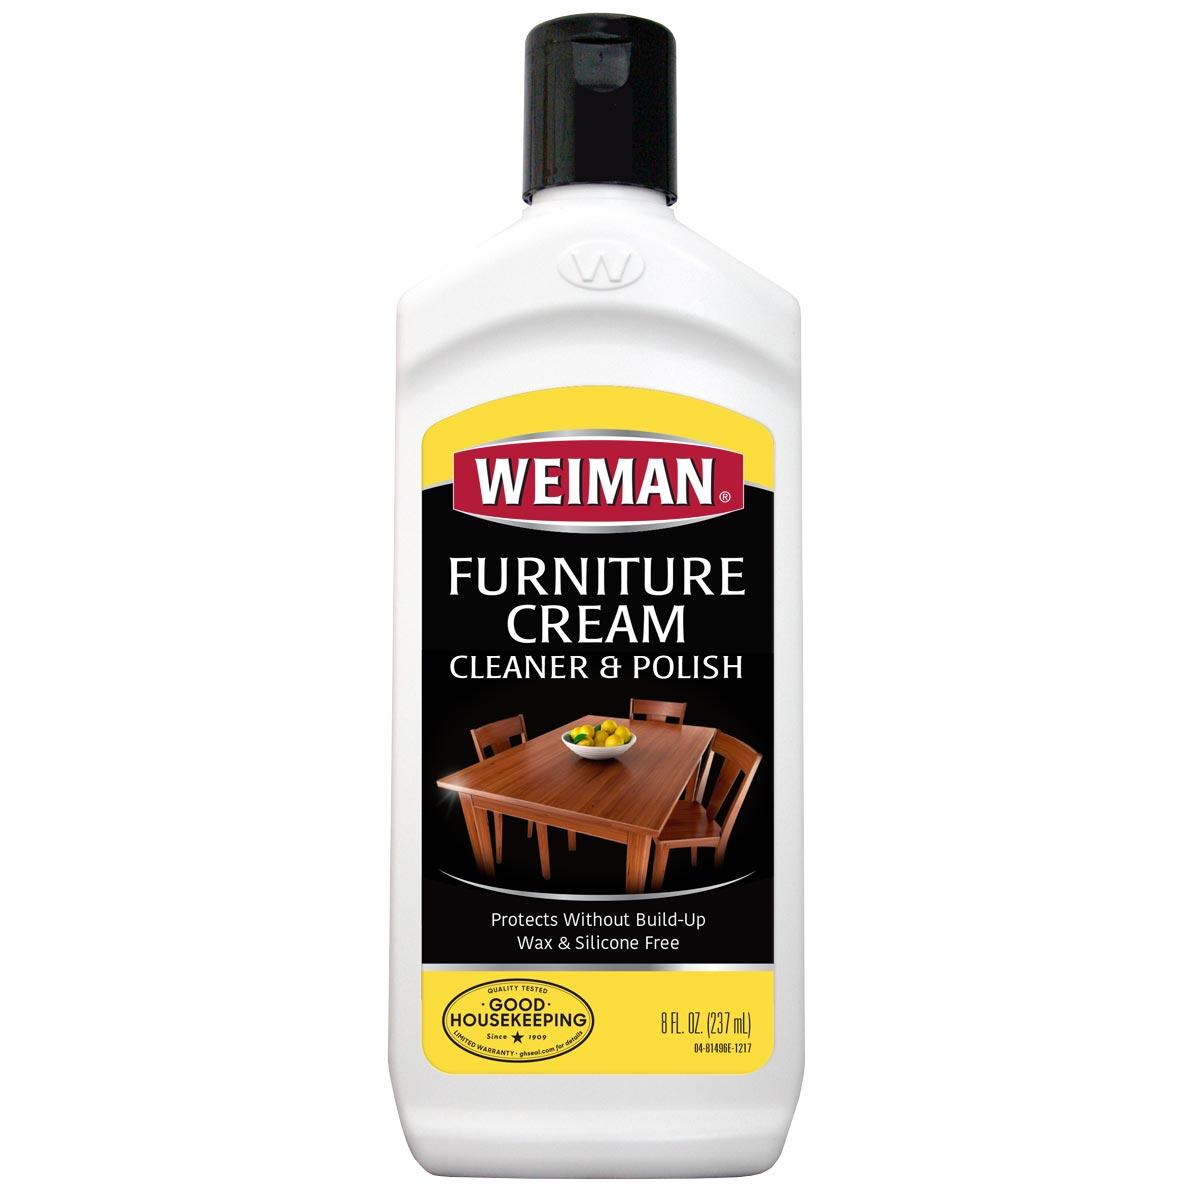 https://googone.com/media/catalog/product/w/e/weiman-furniture-cream_front.jpg